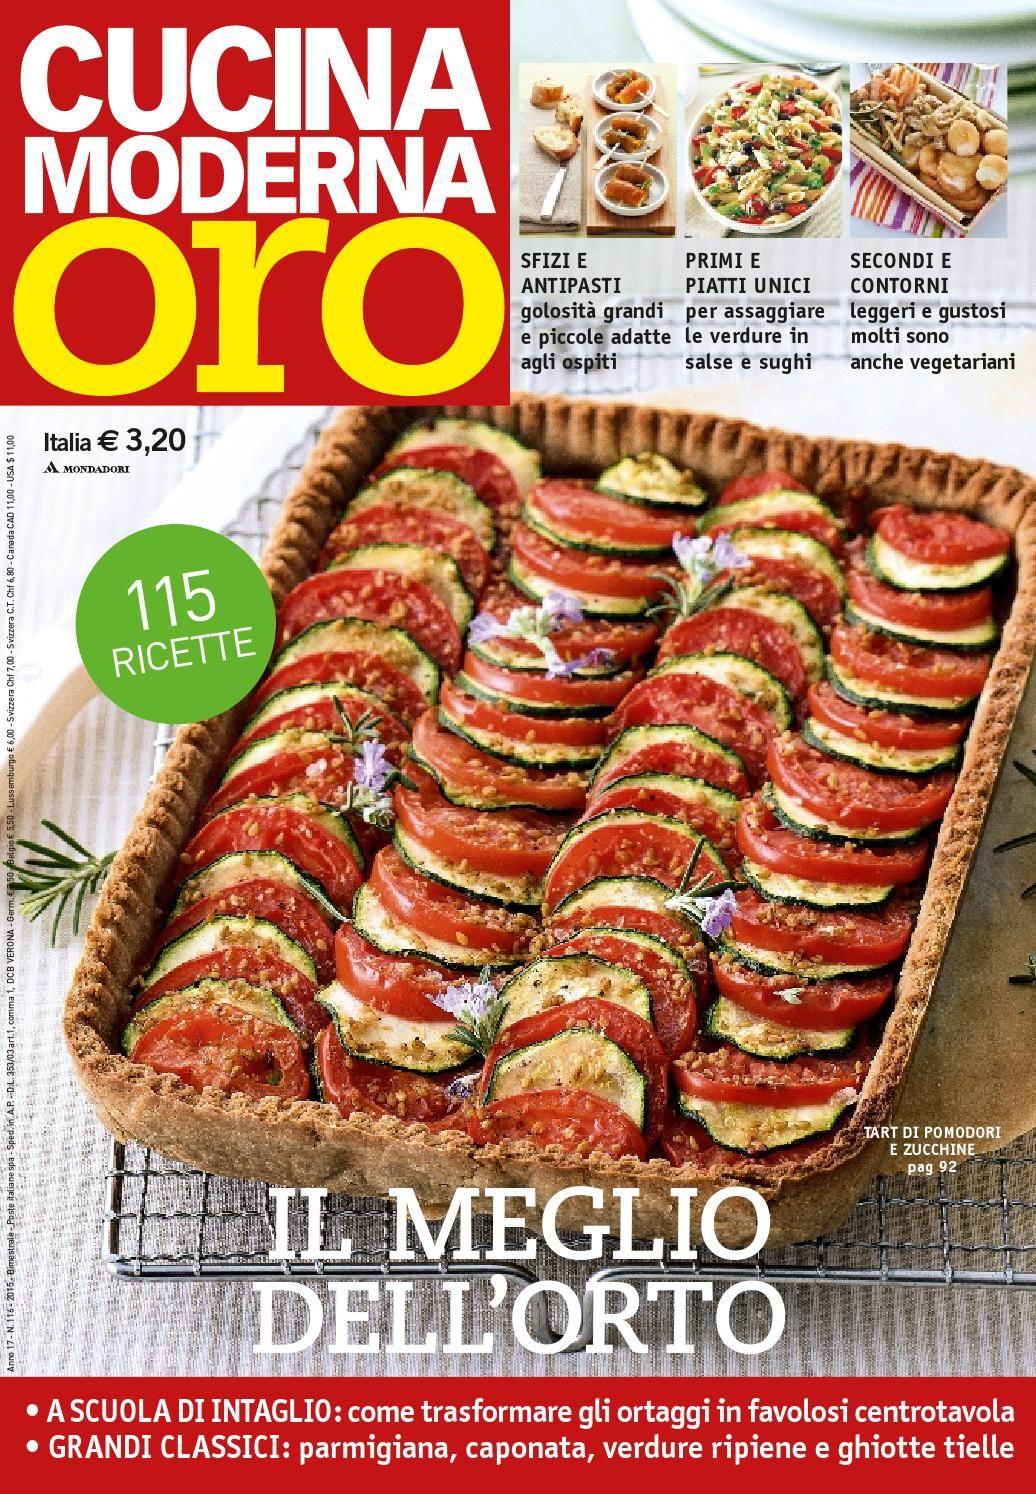 Cucina Moderna Oro.Cucina Moderna Oro 11 06 2015 By M R Gastronomia Italiana